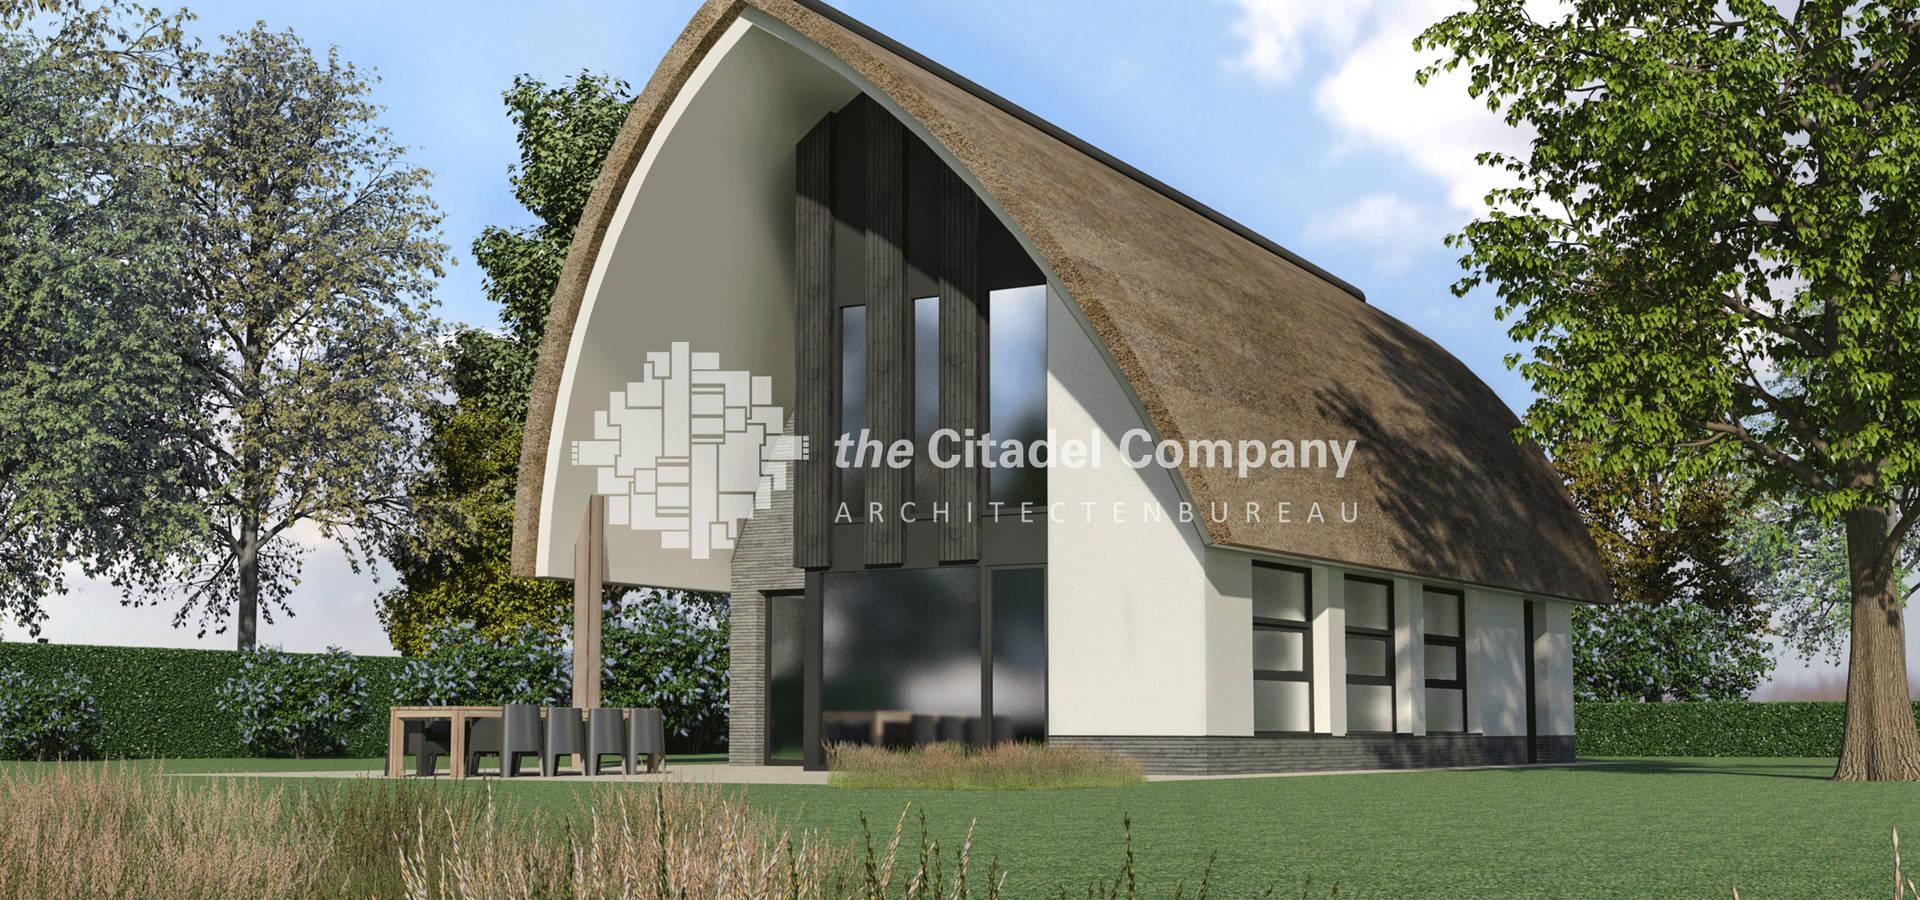 Architectenbureau The Citadel Company